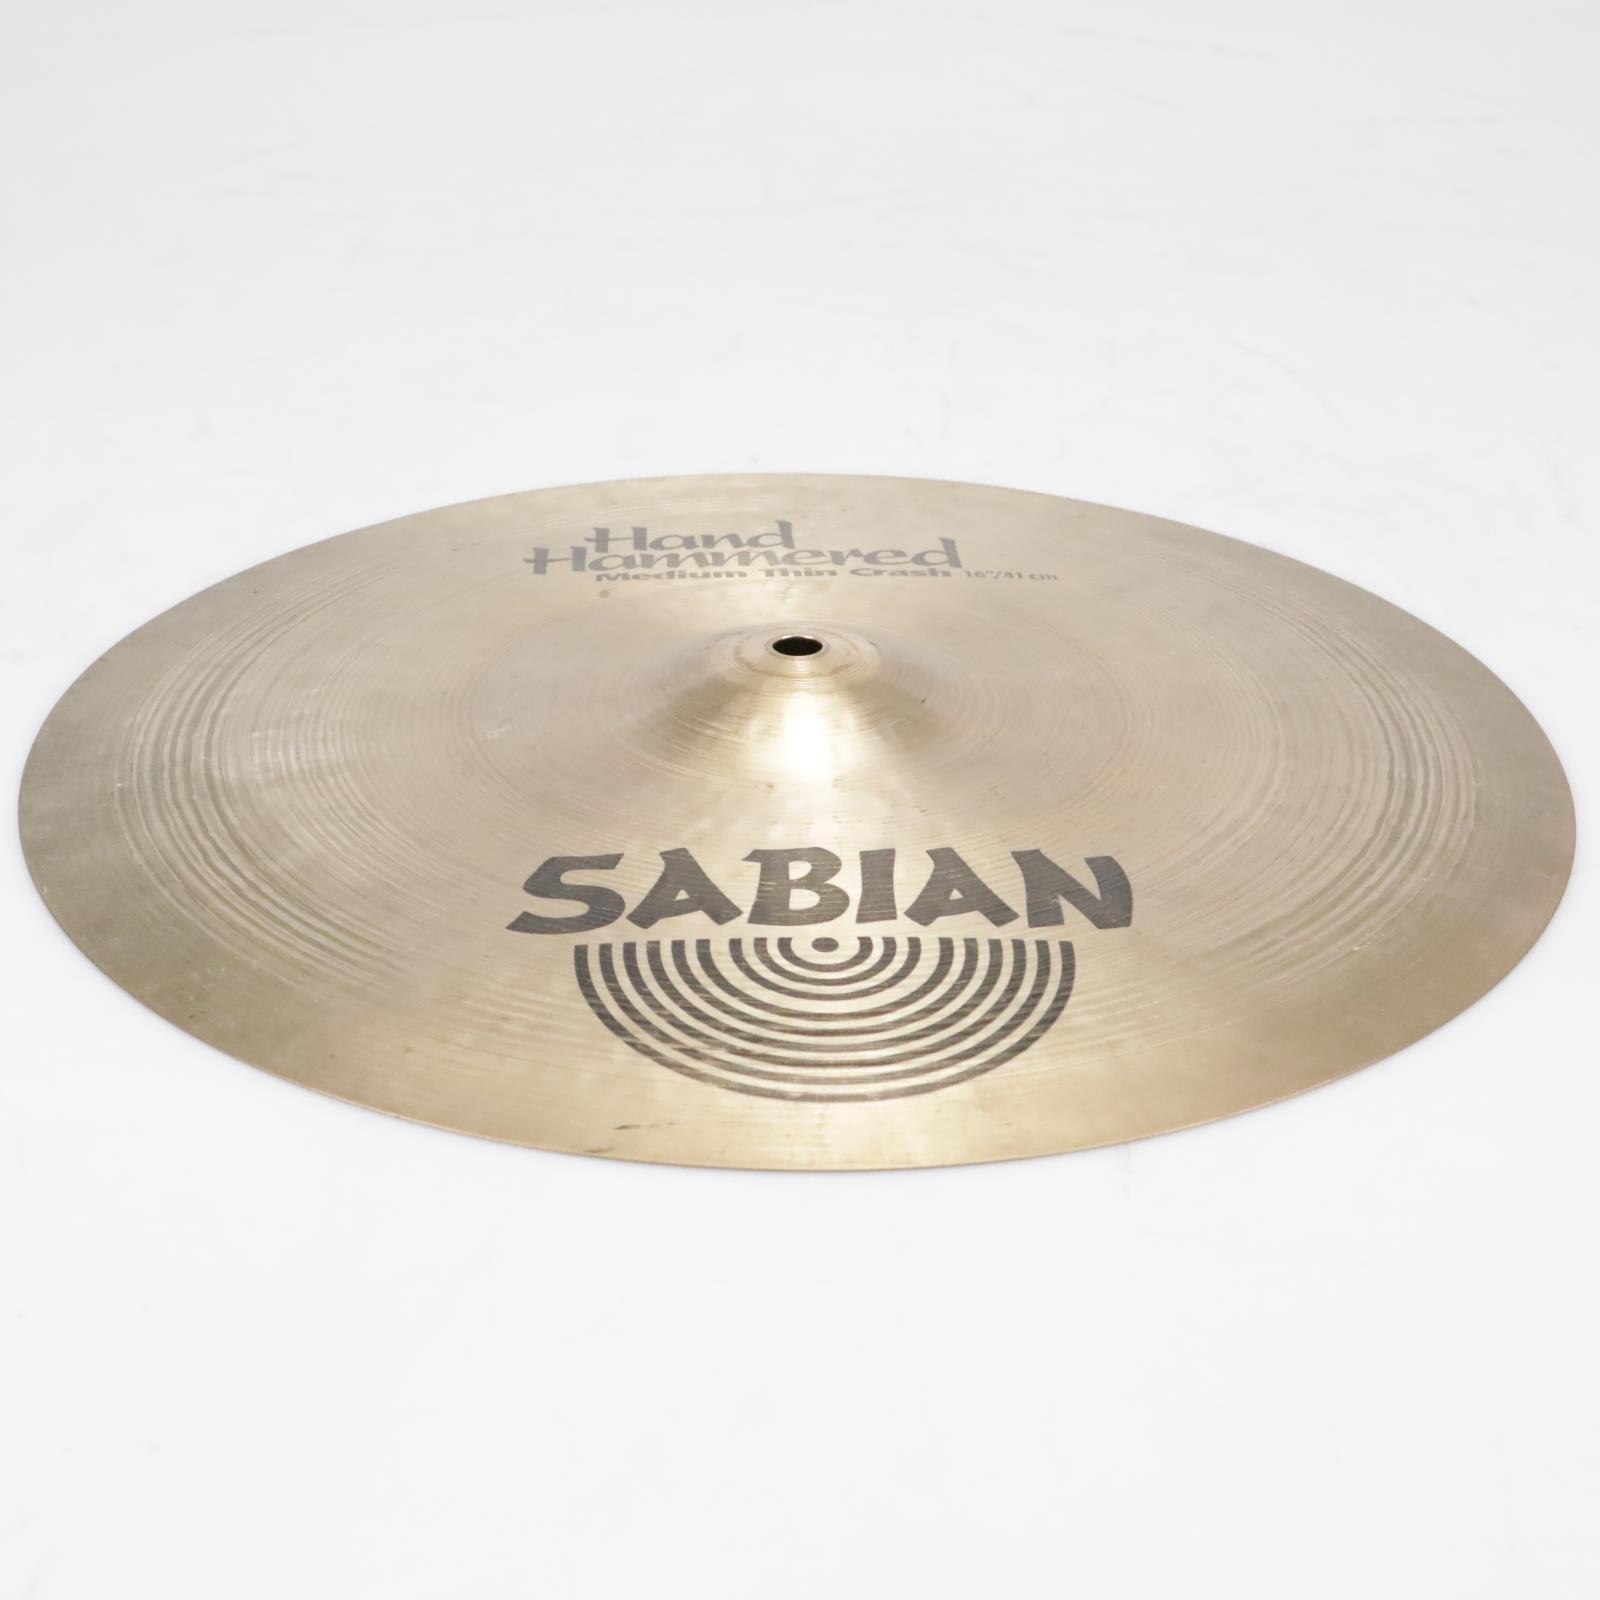 "16"" Sabian HH Hand-Hammered Medium Thin Crash Cymbal Video! #41289"